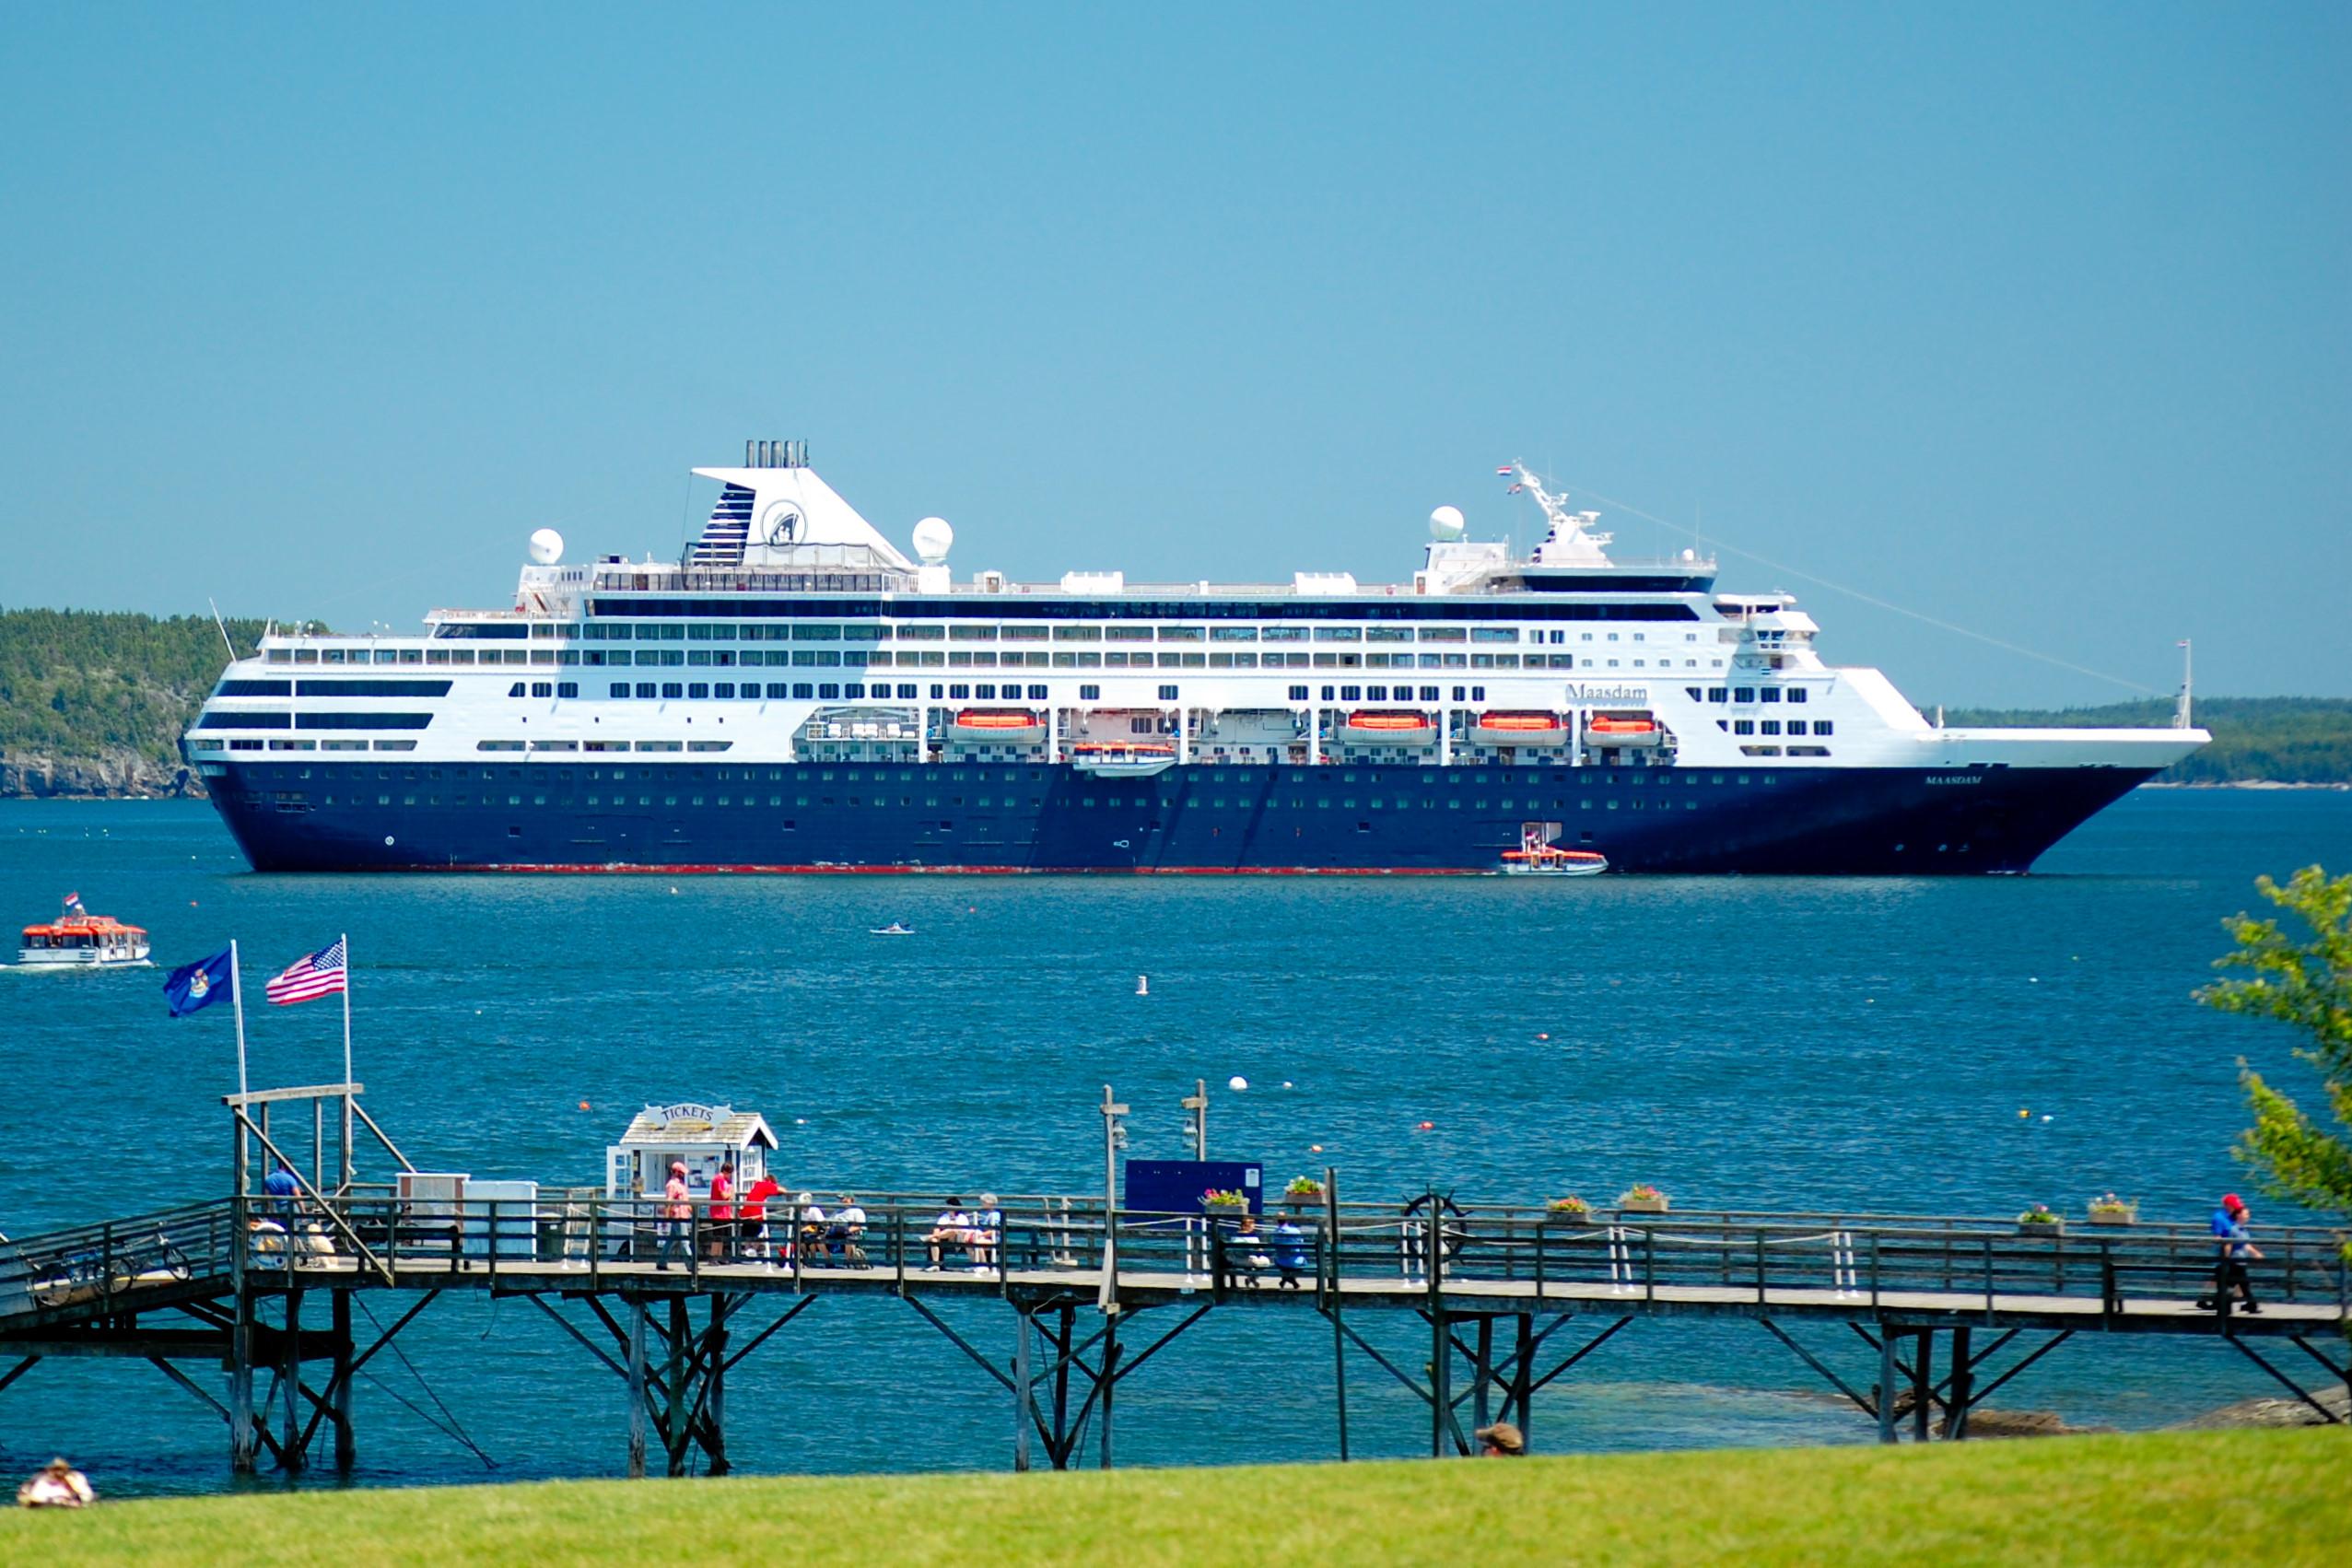 FileMS Maasdam Bar Harbor MEjpg Wikimedia Commons - Cruise ship bar harbor